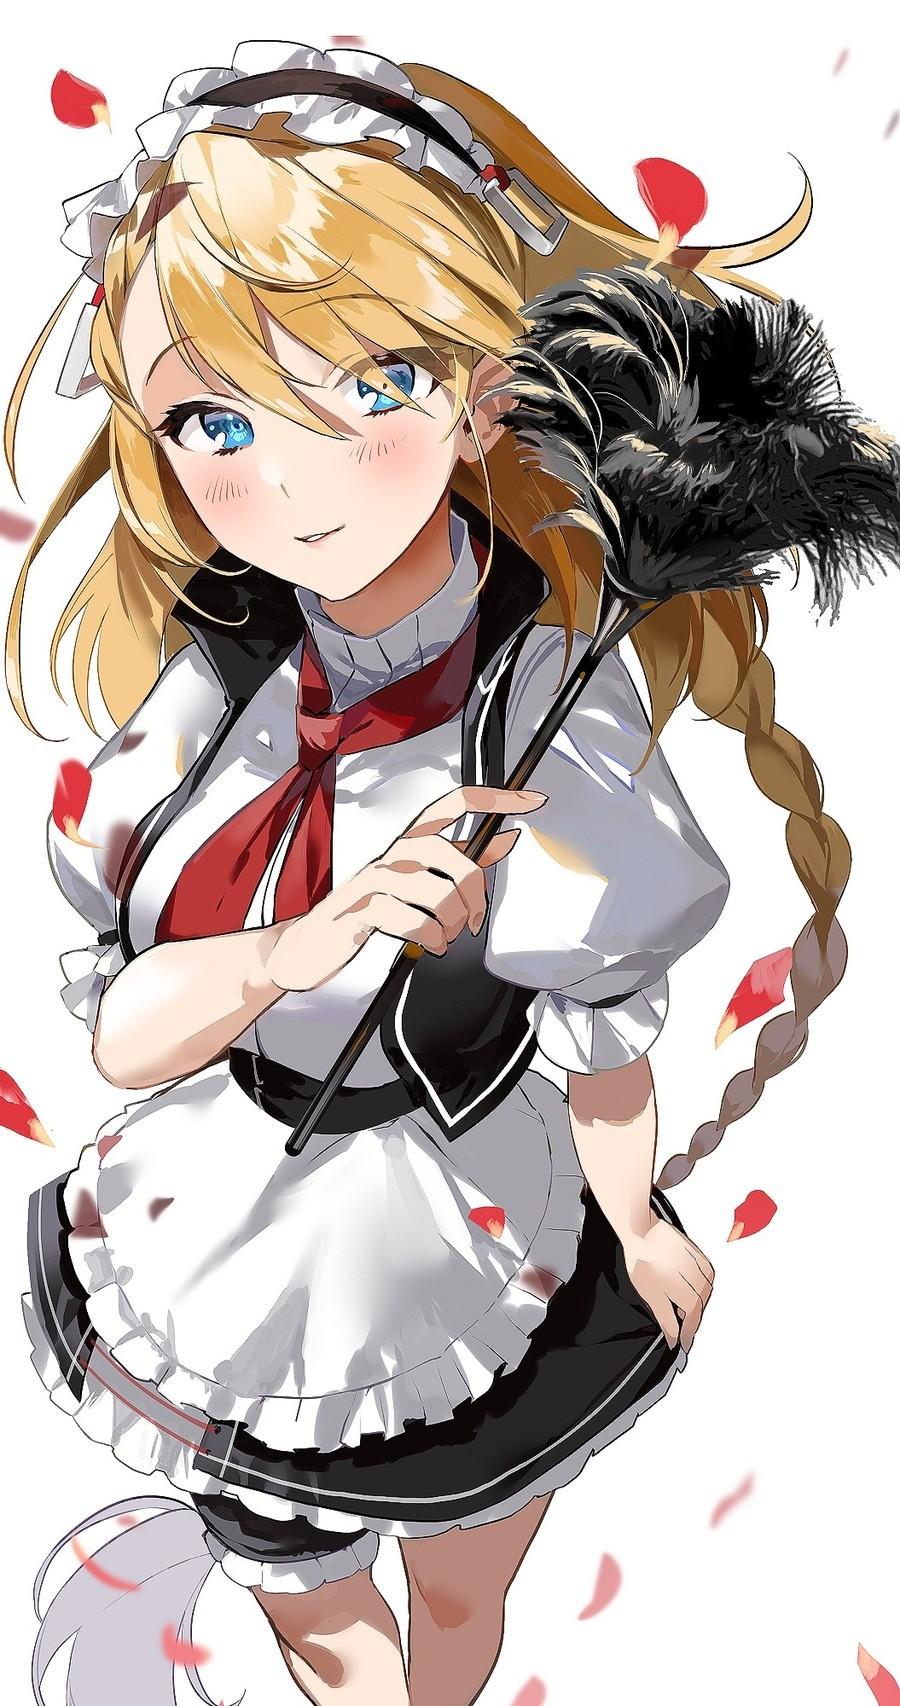 Maid March part 22. join list: SplendidServants (486 subs)Mention History join list:. German meido waifu.